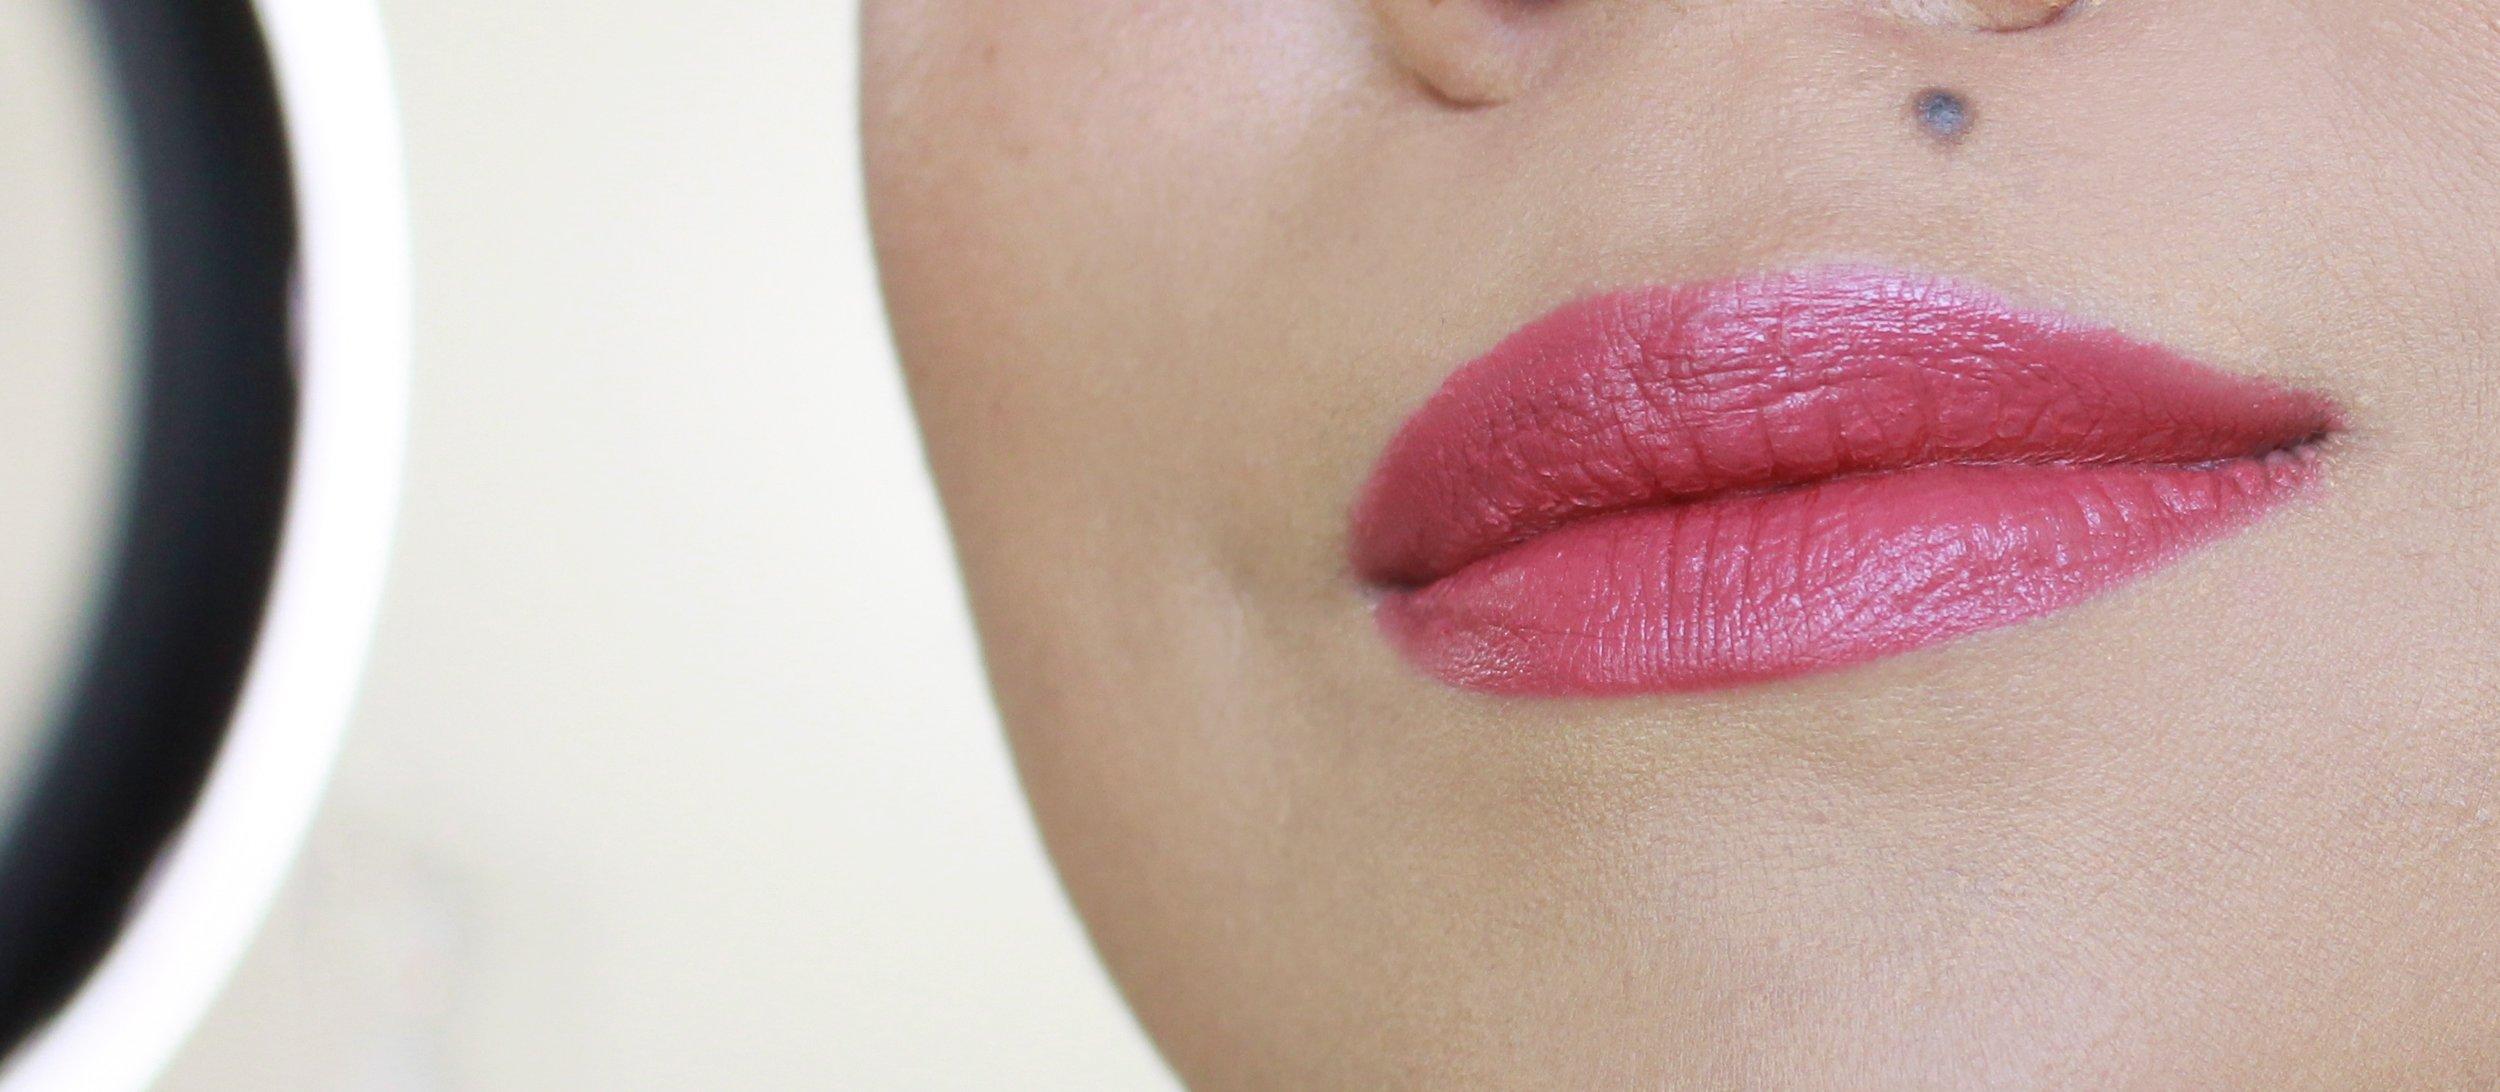 Marc Jacobs Le Marc Lip Creme in Kiss Kiss Bang Bang